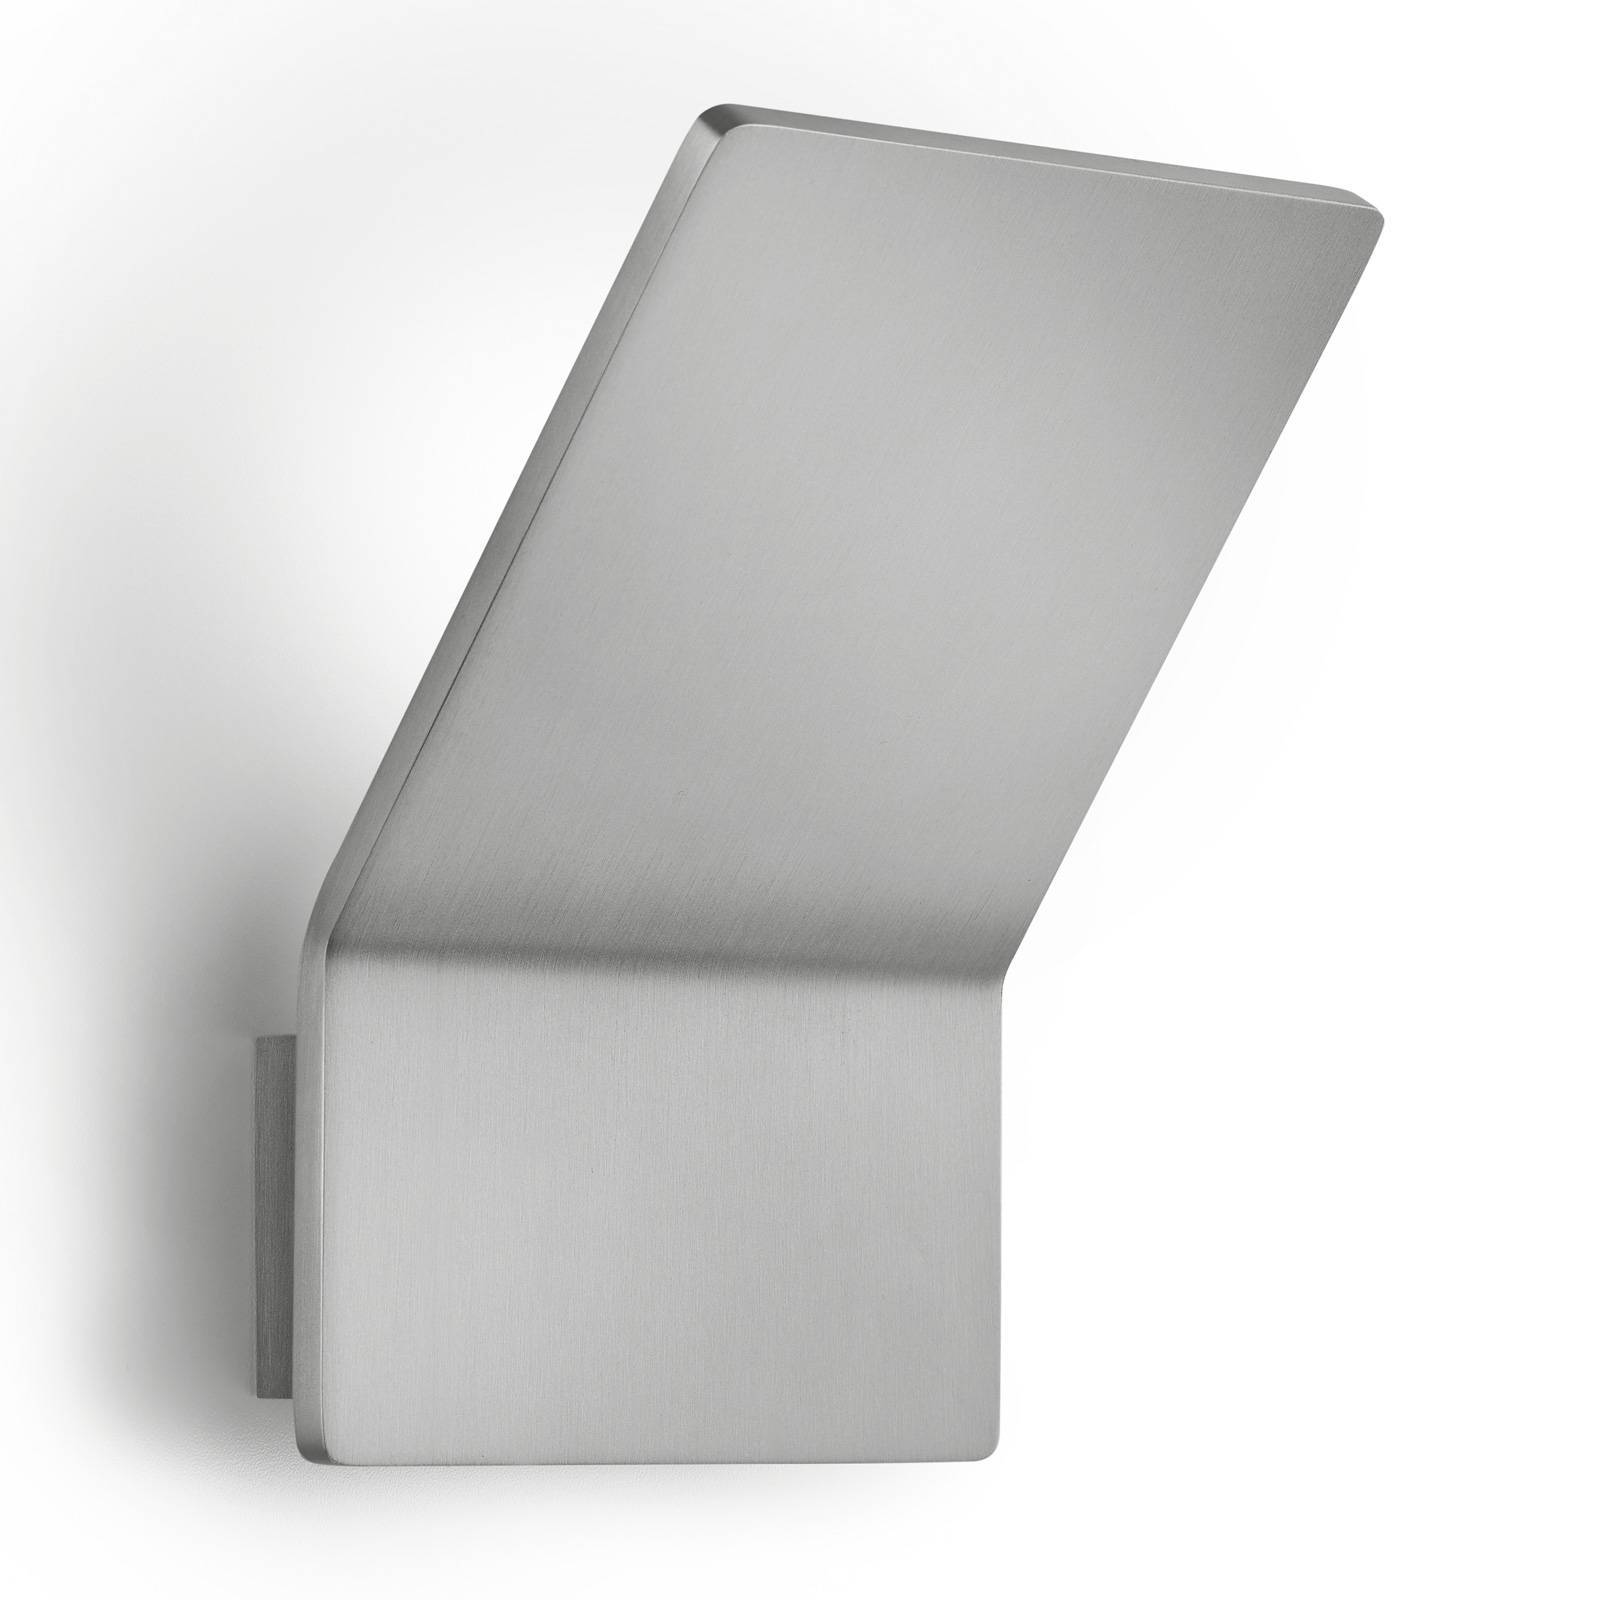 LED-Wandleuchte Ann-2, nickel, dimmbar